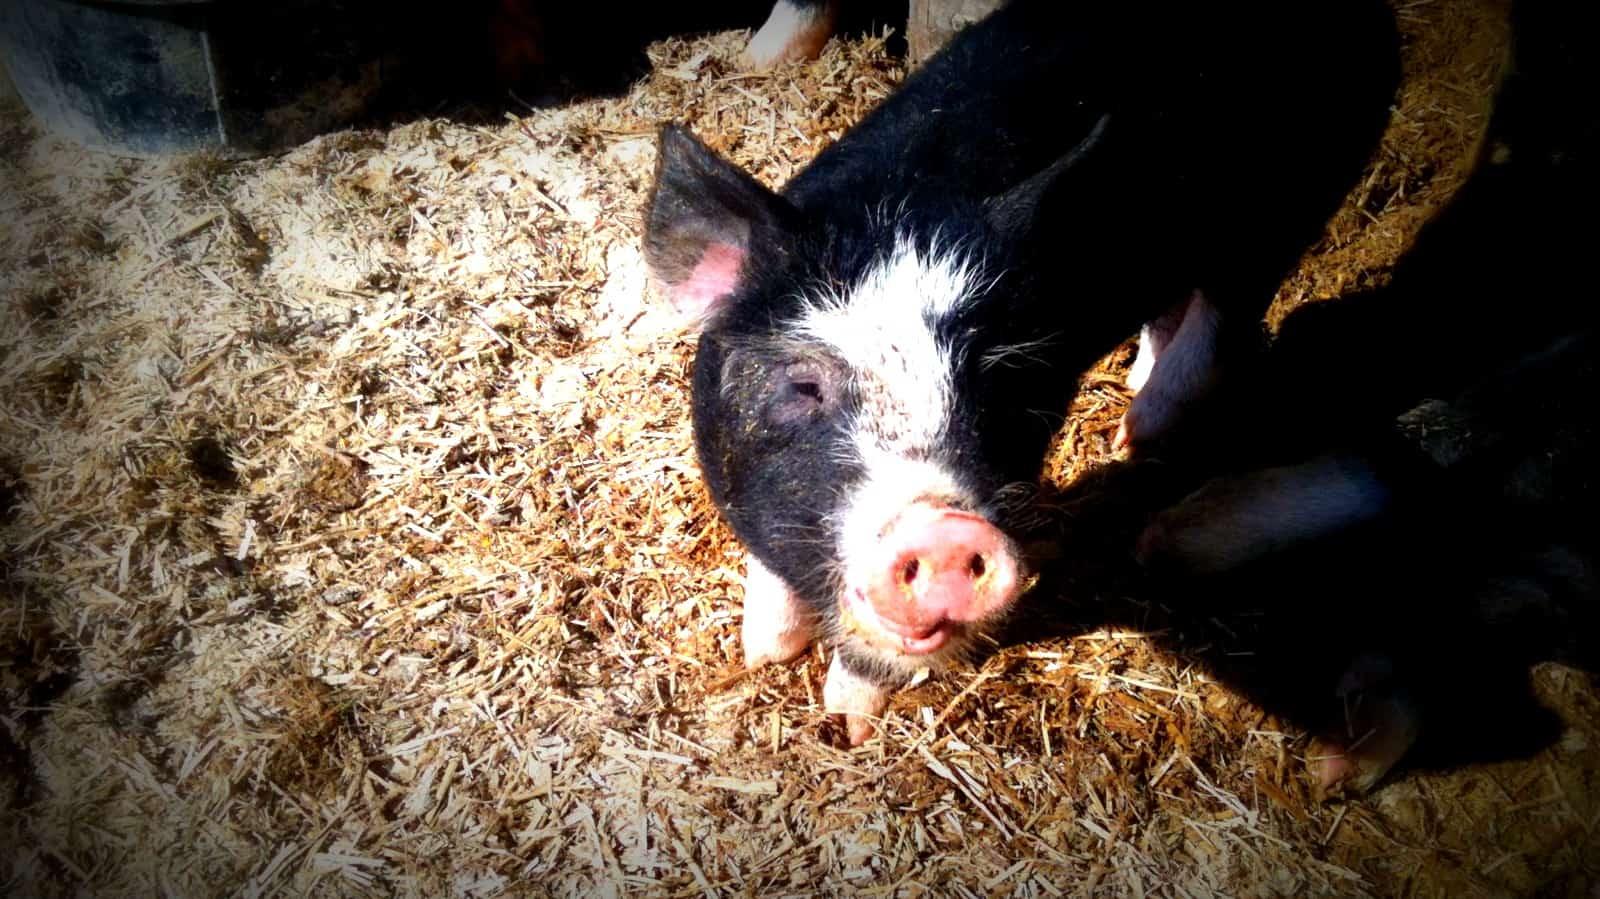 Pig Share Spring 2015